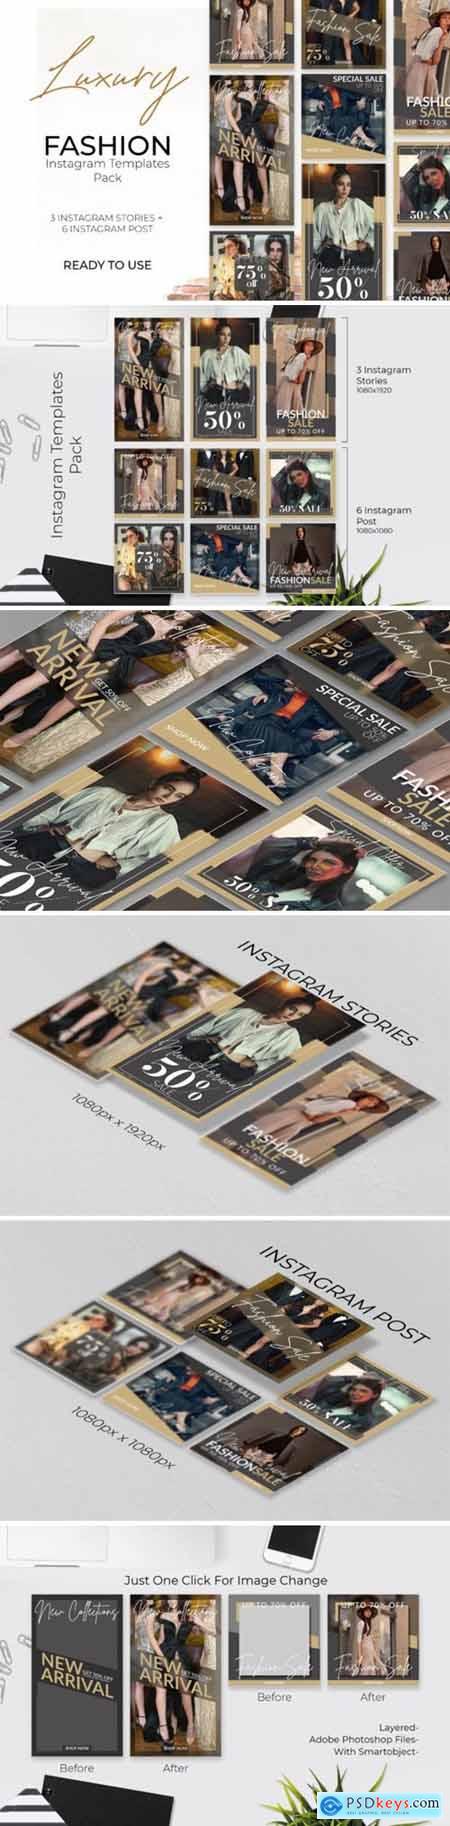 Instagram Post & Stories Template Pack 1684629